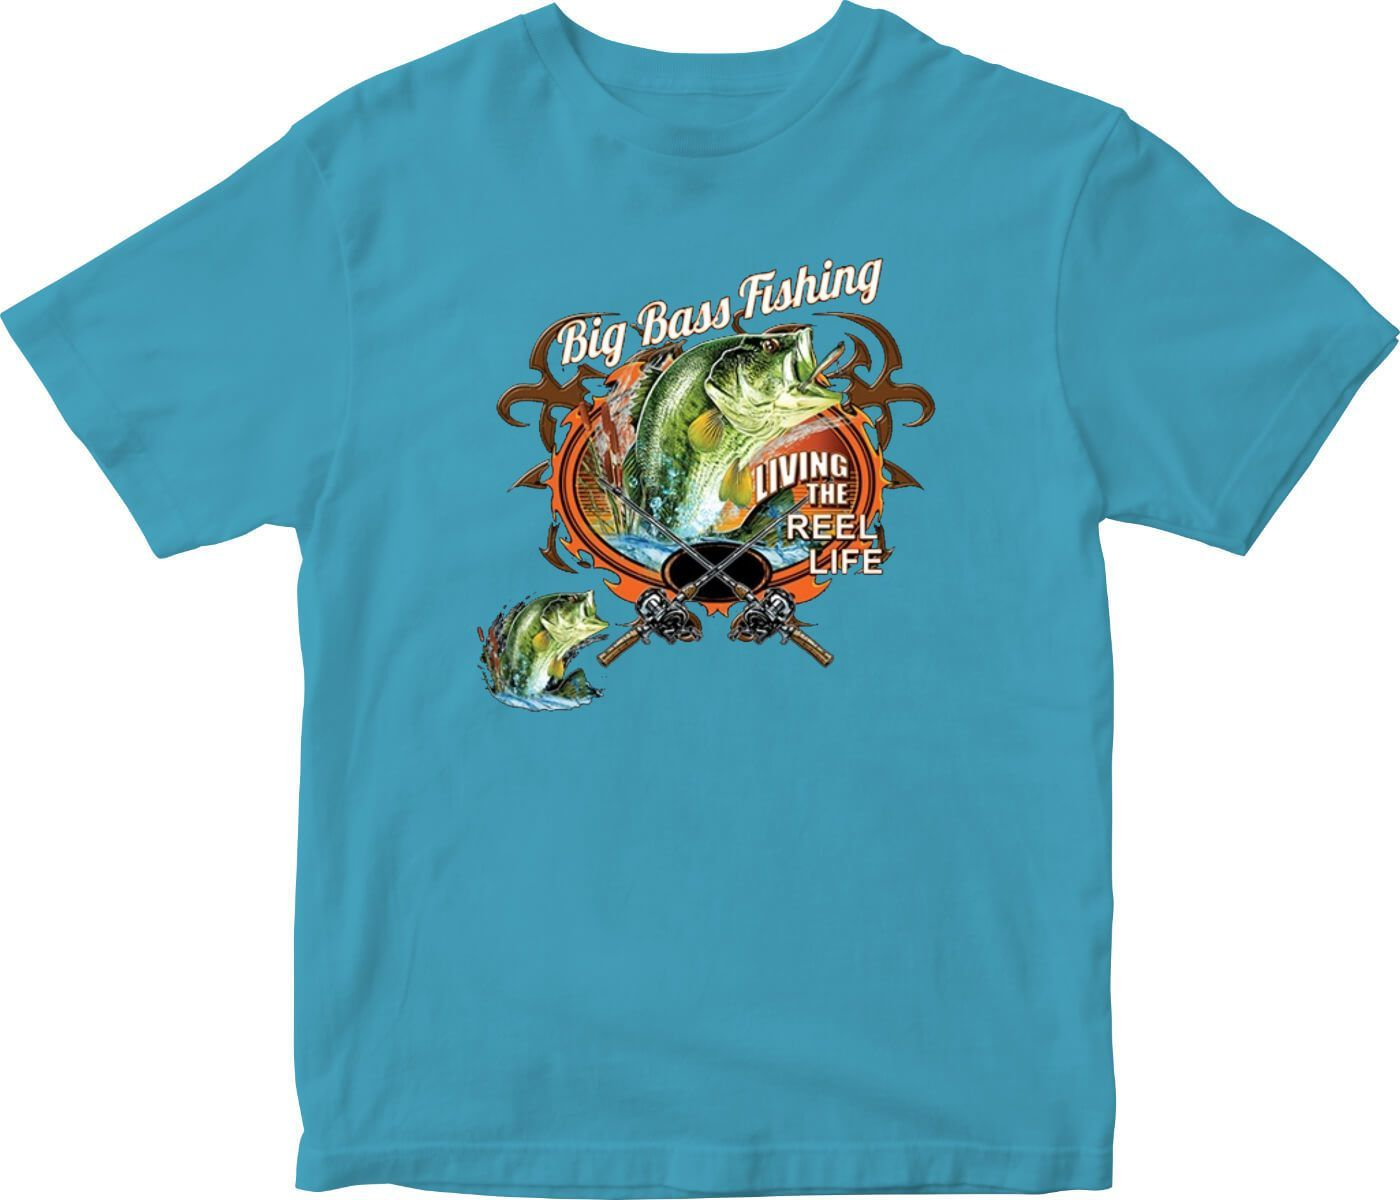 8e33e585abc Big Bass Fishing Printed T-Shirt Tall | Products | Bass fishing ...